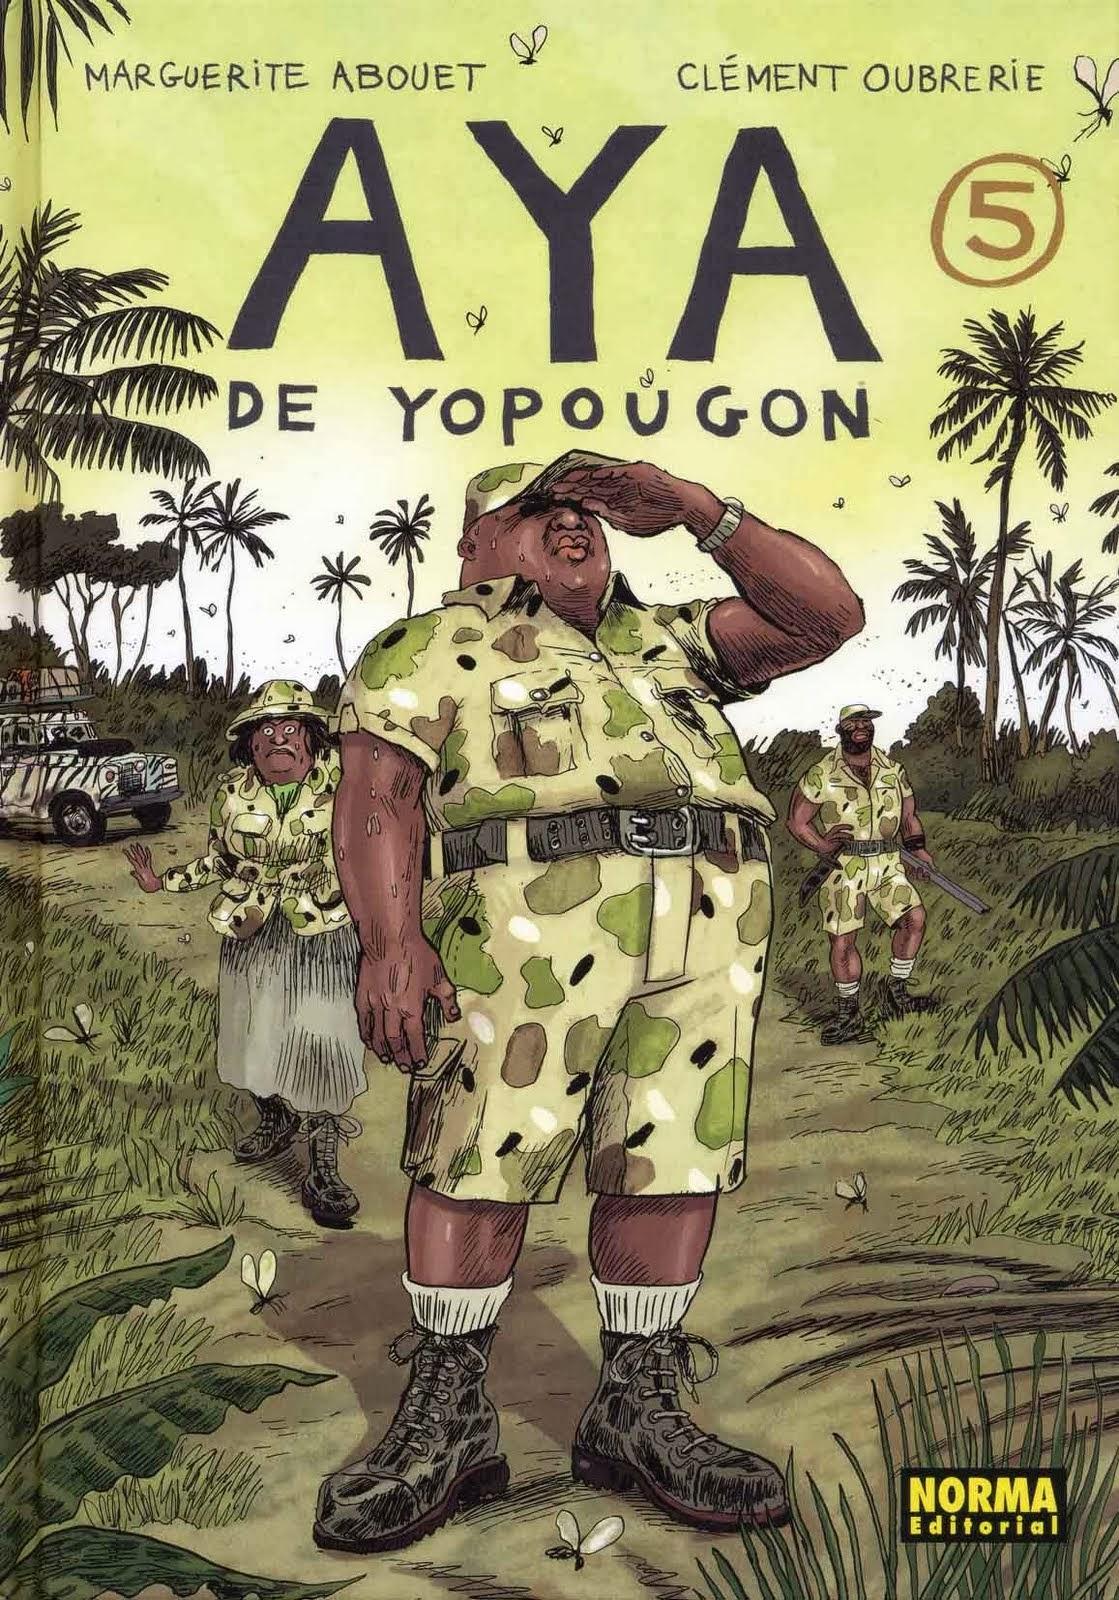 Aya de Yopougon 5,Marguerite Abouet, Clément Oubrerie,Norma Editorial  tienda de comics en México distrito federal, venta de comics en México df